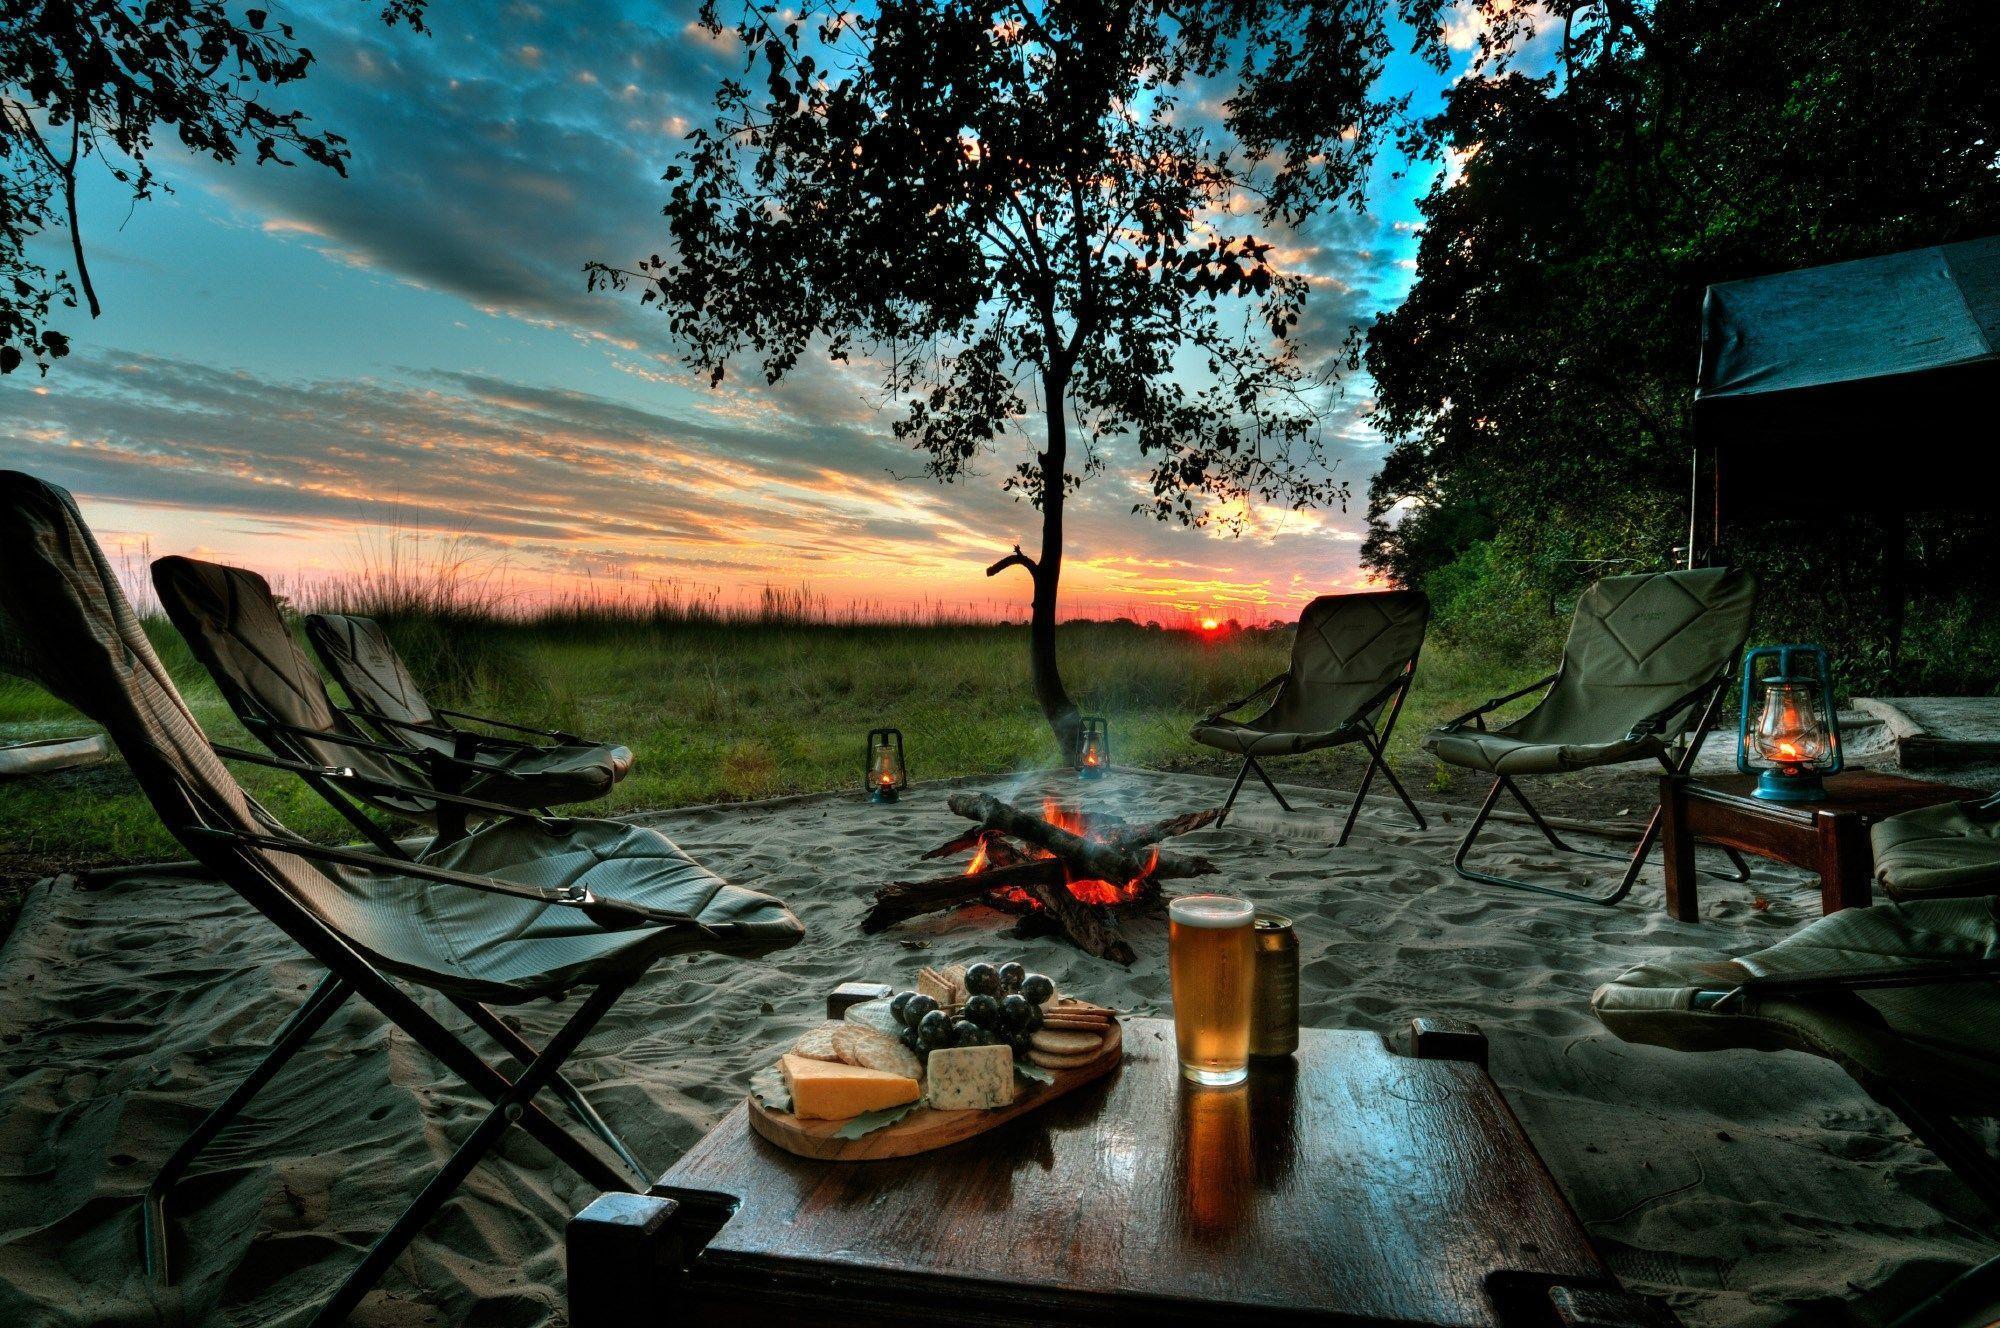 Camping Desktop Wallpapers Top Free Camping Desktop Backgrounds Wallpaperaccess